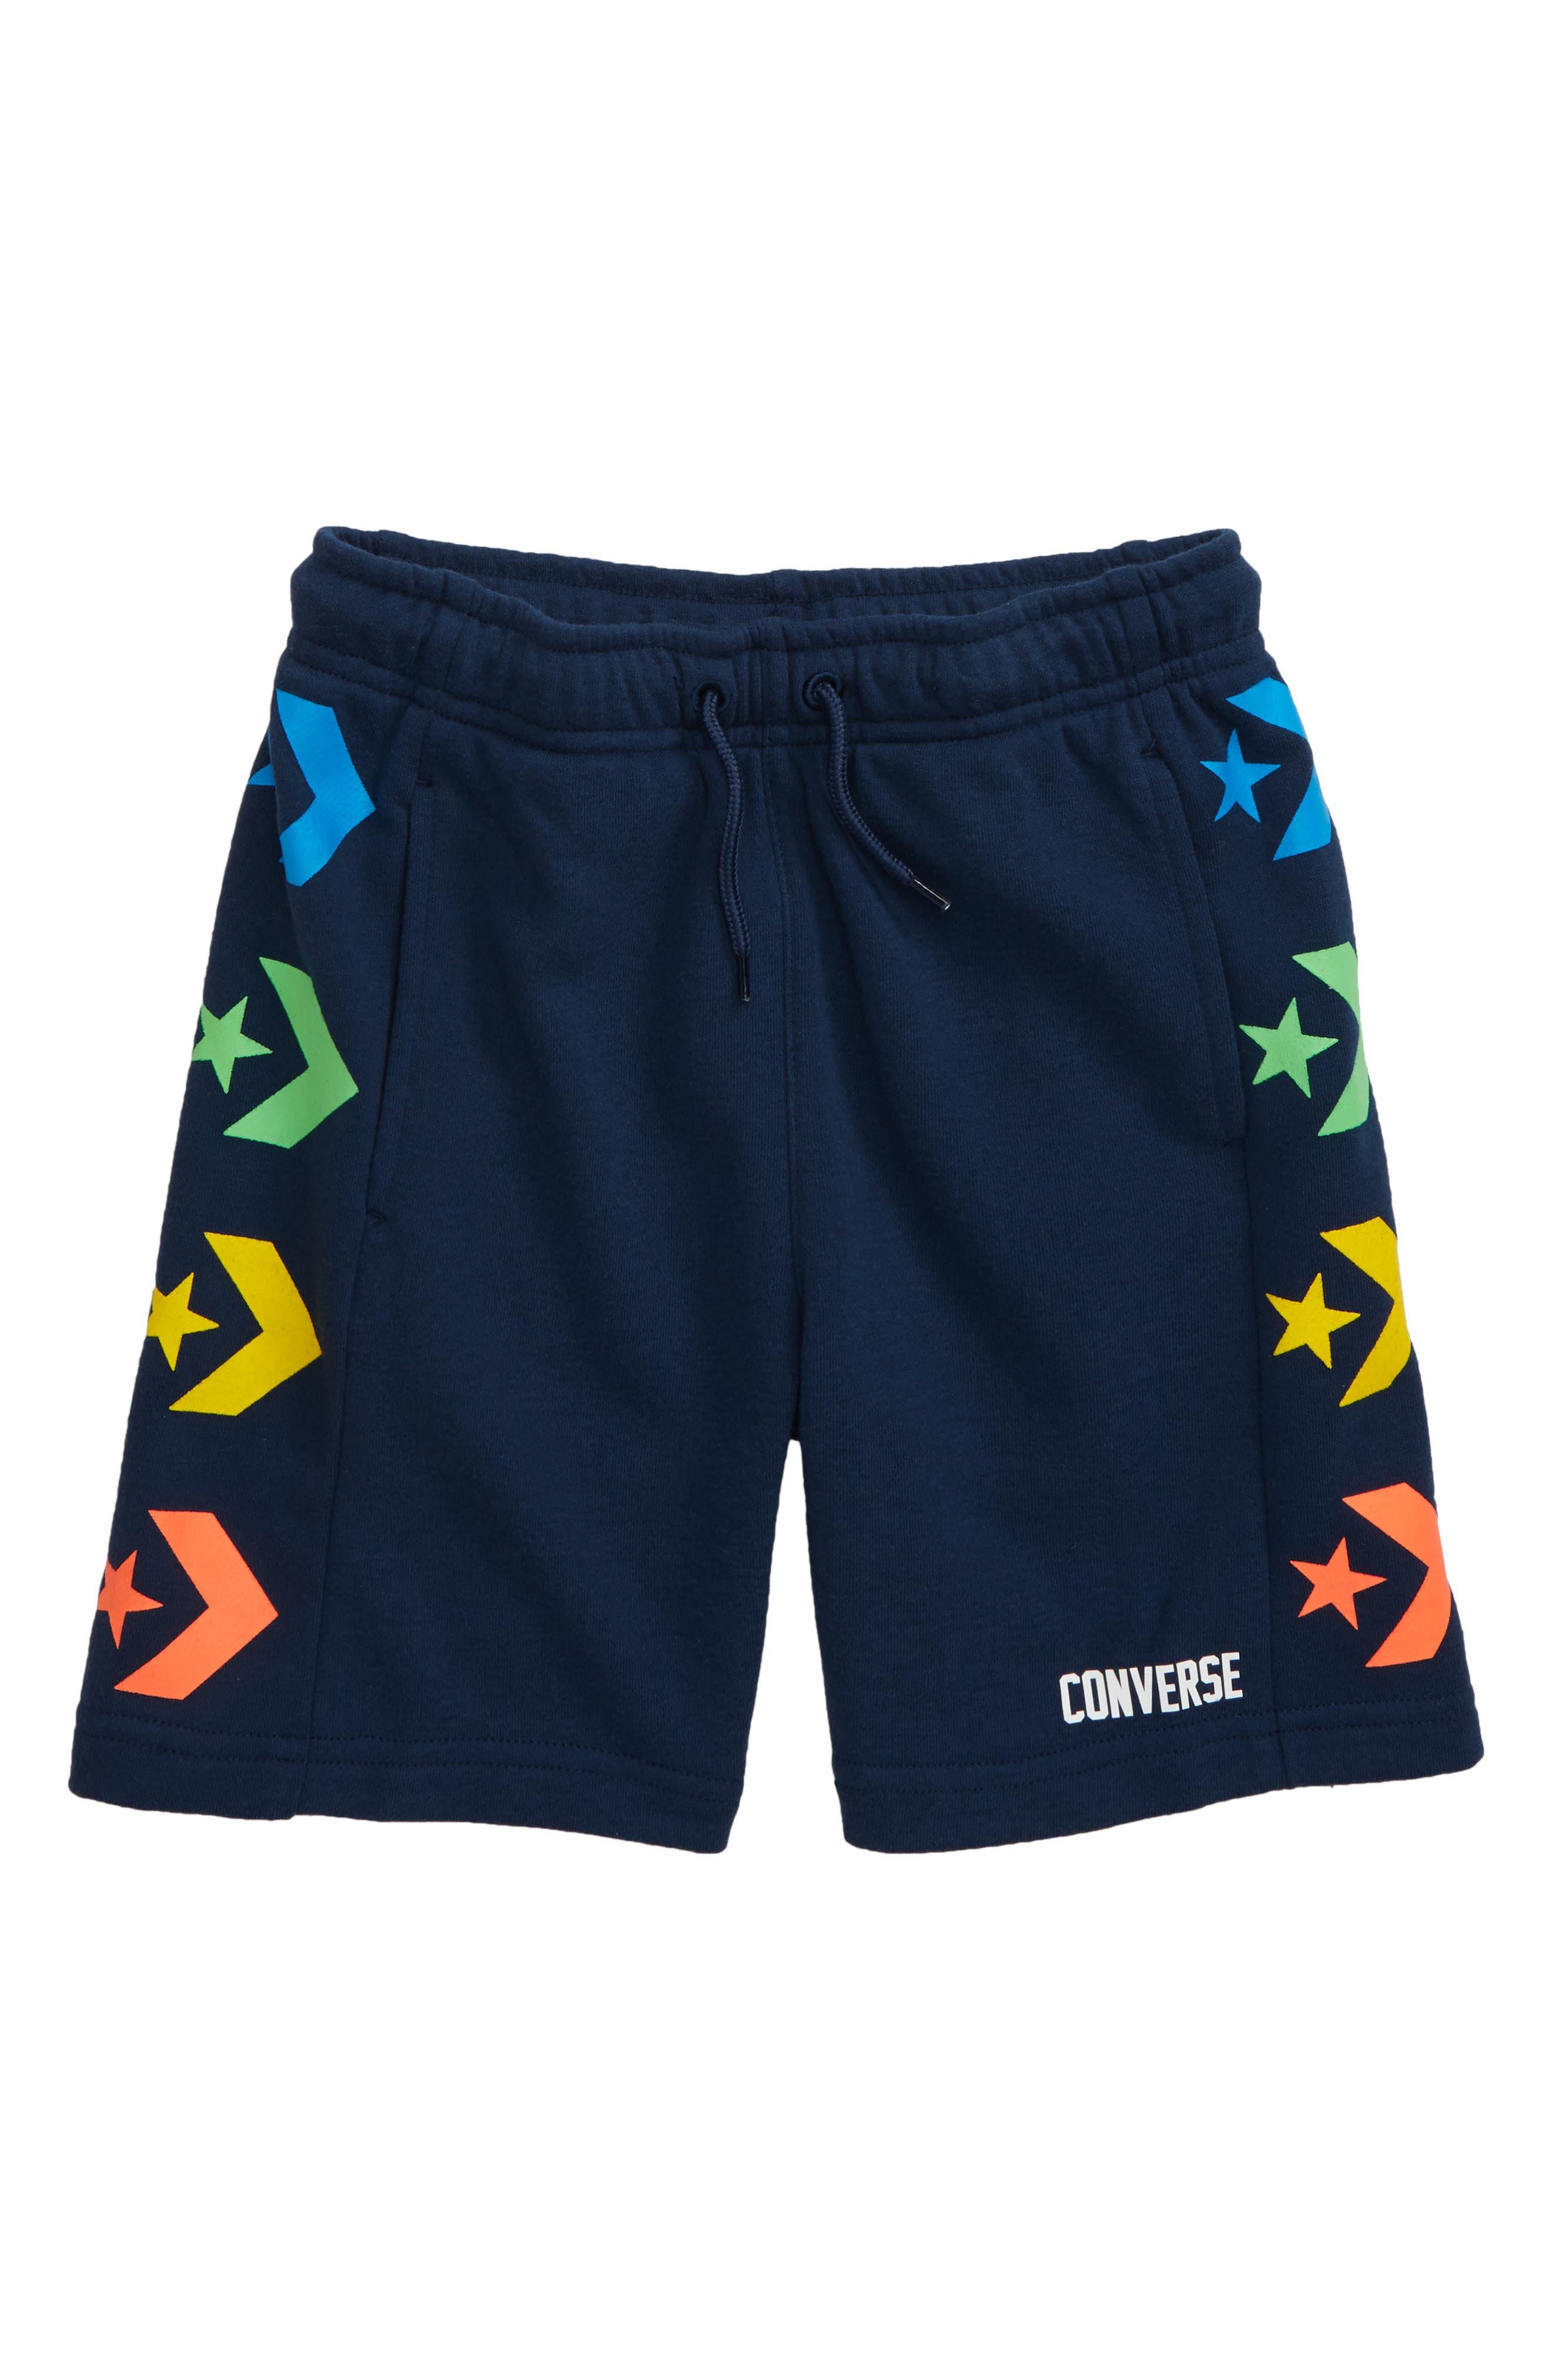 Boys Converse Star Chevron Print Knit Athletic Shorts Size XL (1315y)  Blue